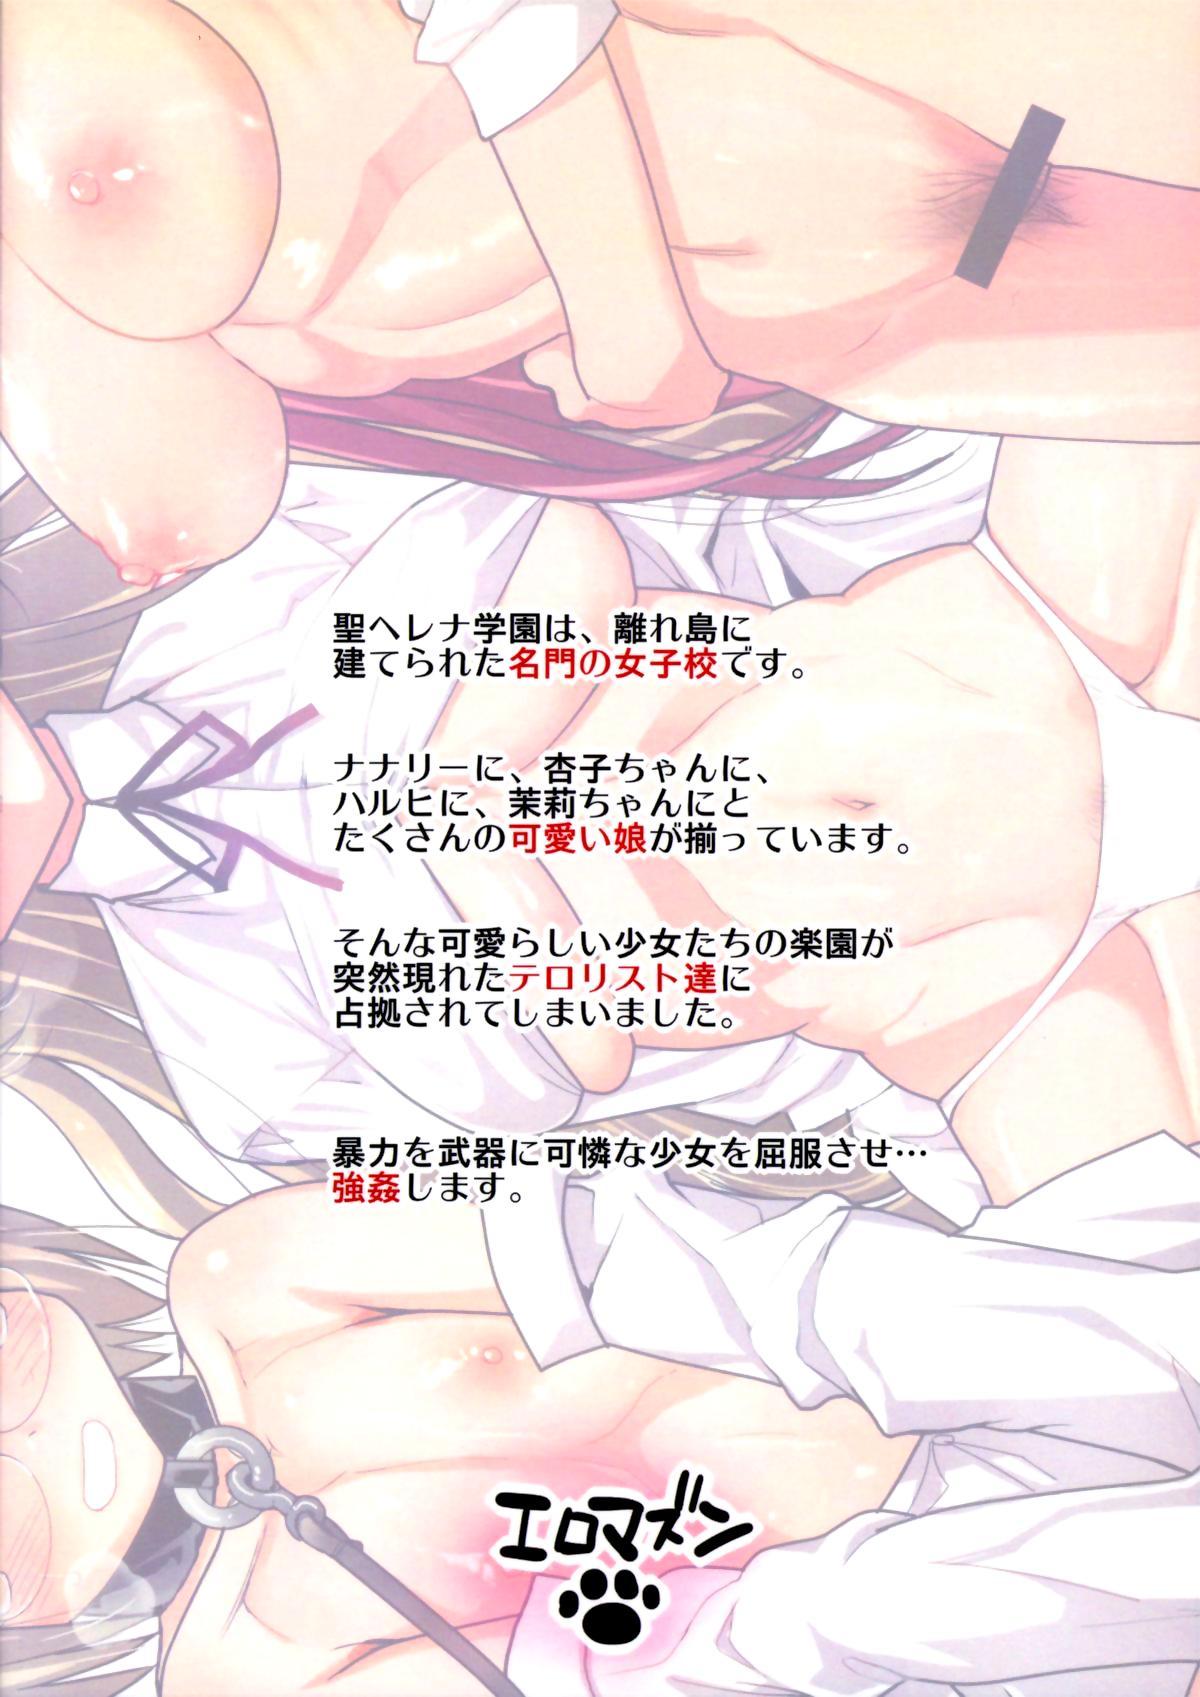 [Eromazun (Ma-Kurou)] Saint Helena Gakuen ~ Terrorist ni Senkyosareta Jogakuen de Rape Matsuri!~   Saint Helena Academy ~A School Occupied by Terrorists Becomes a Rape Festival!~ (Various) [English] [B.E.C. Scans] 42